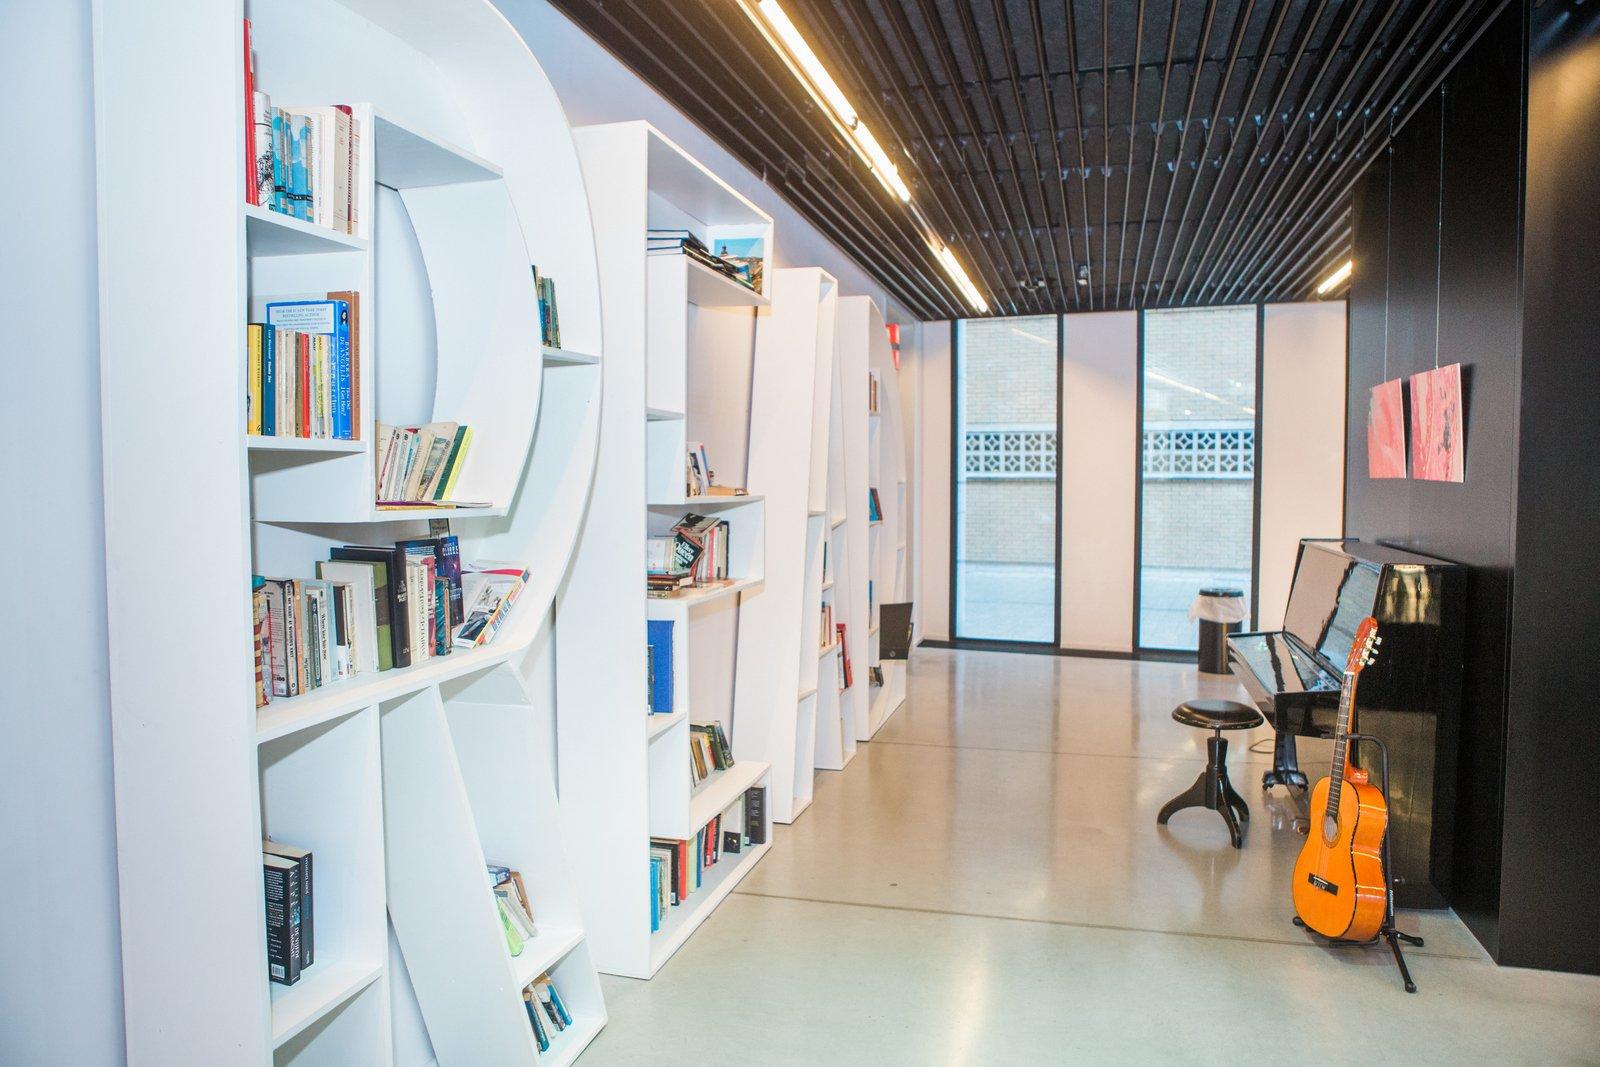 De lounge en bibliotheek